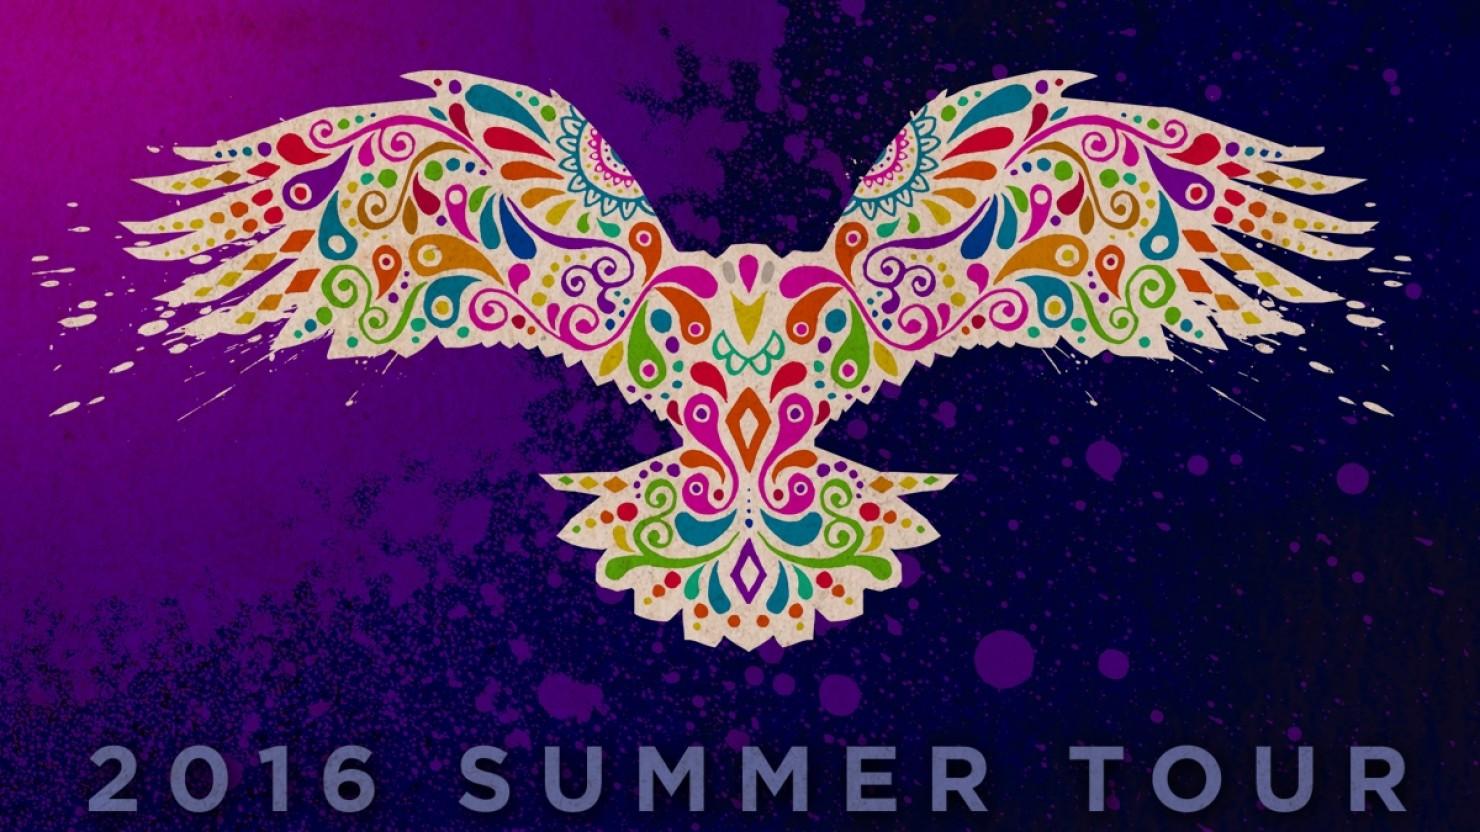 WIDESPREAD PANIC Tour Dates 2016 - 2017 - concert images & videos ...